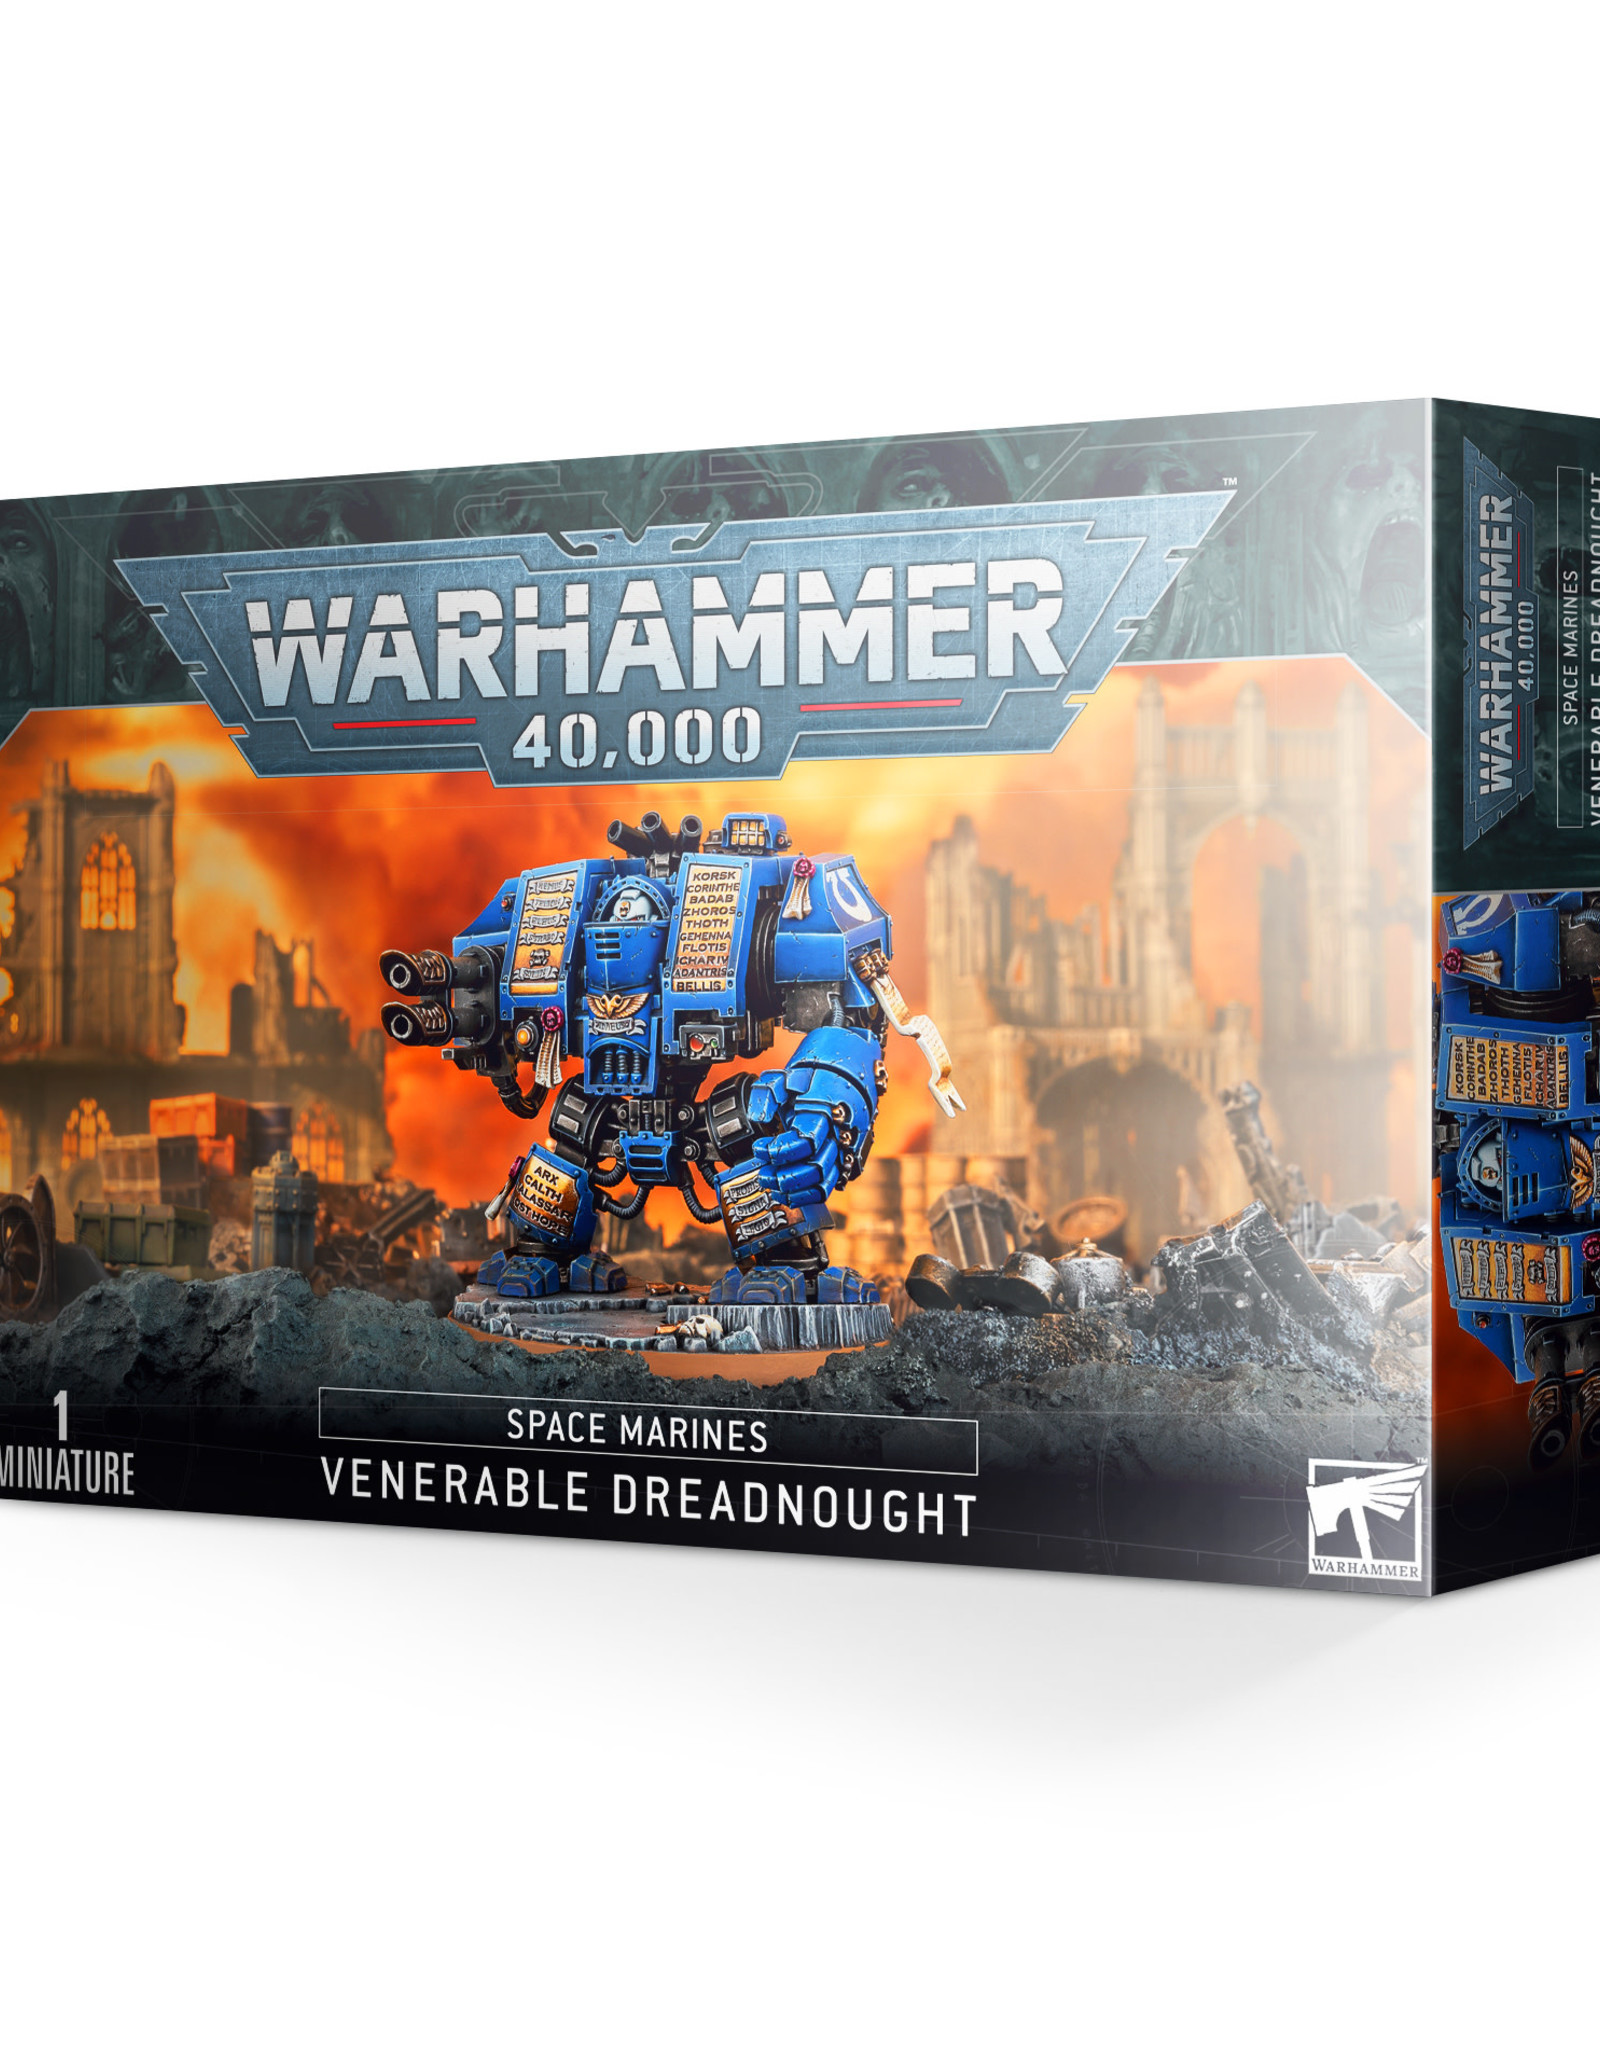 Warhammer 40K Space Marine Venerable Dreadnought